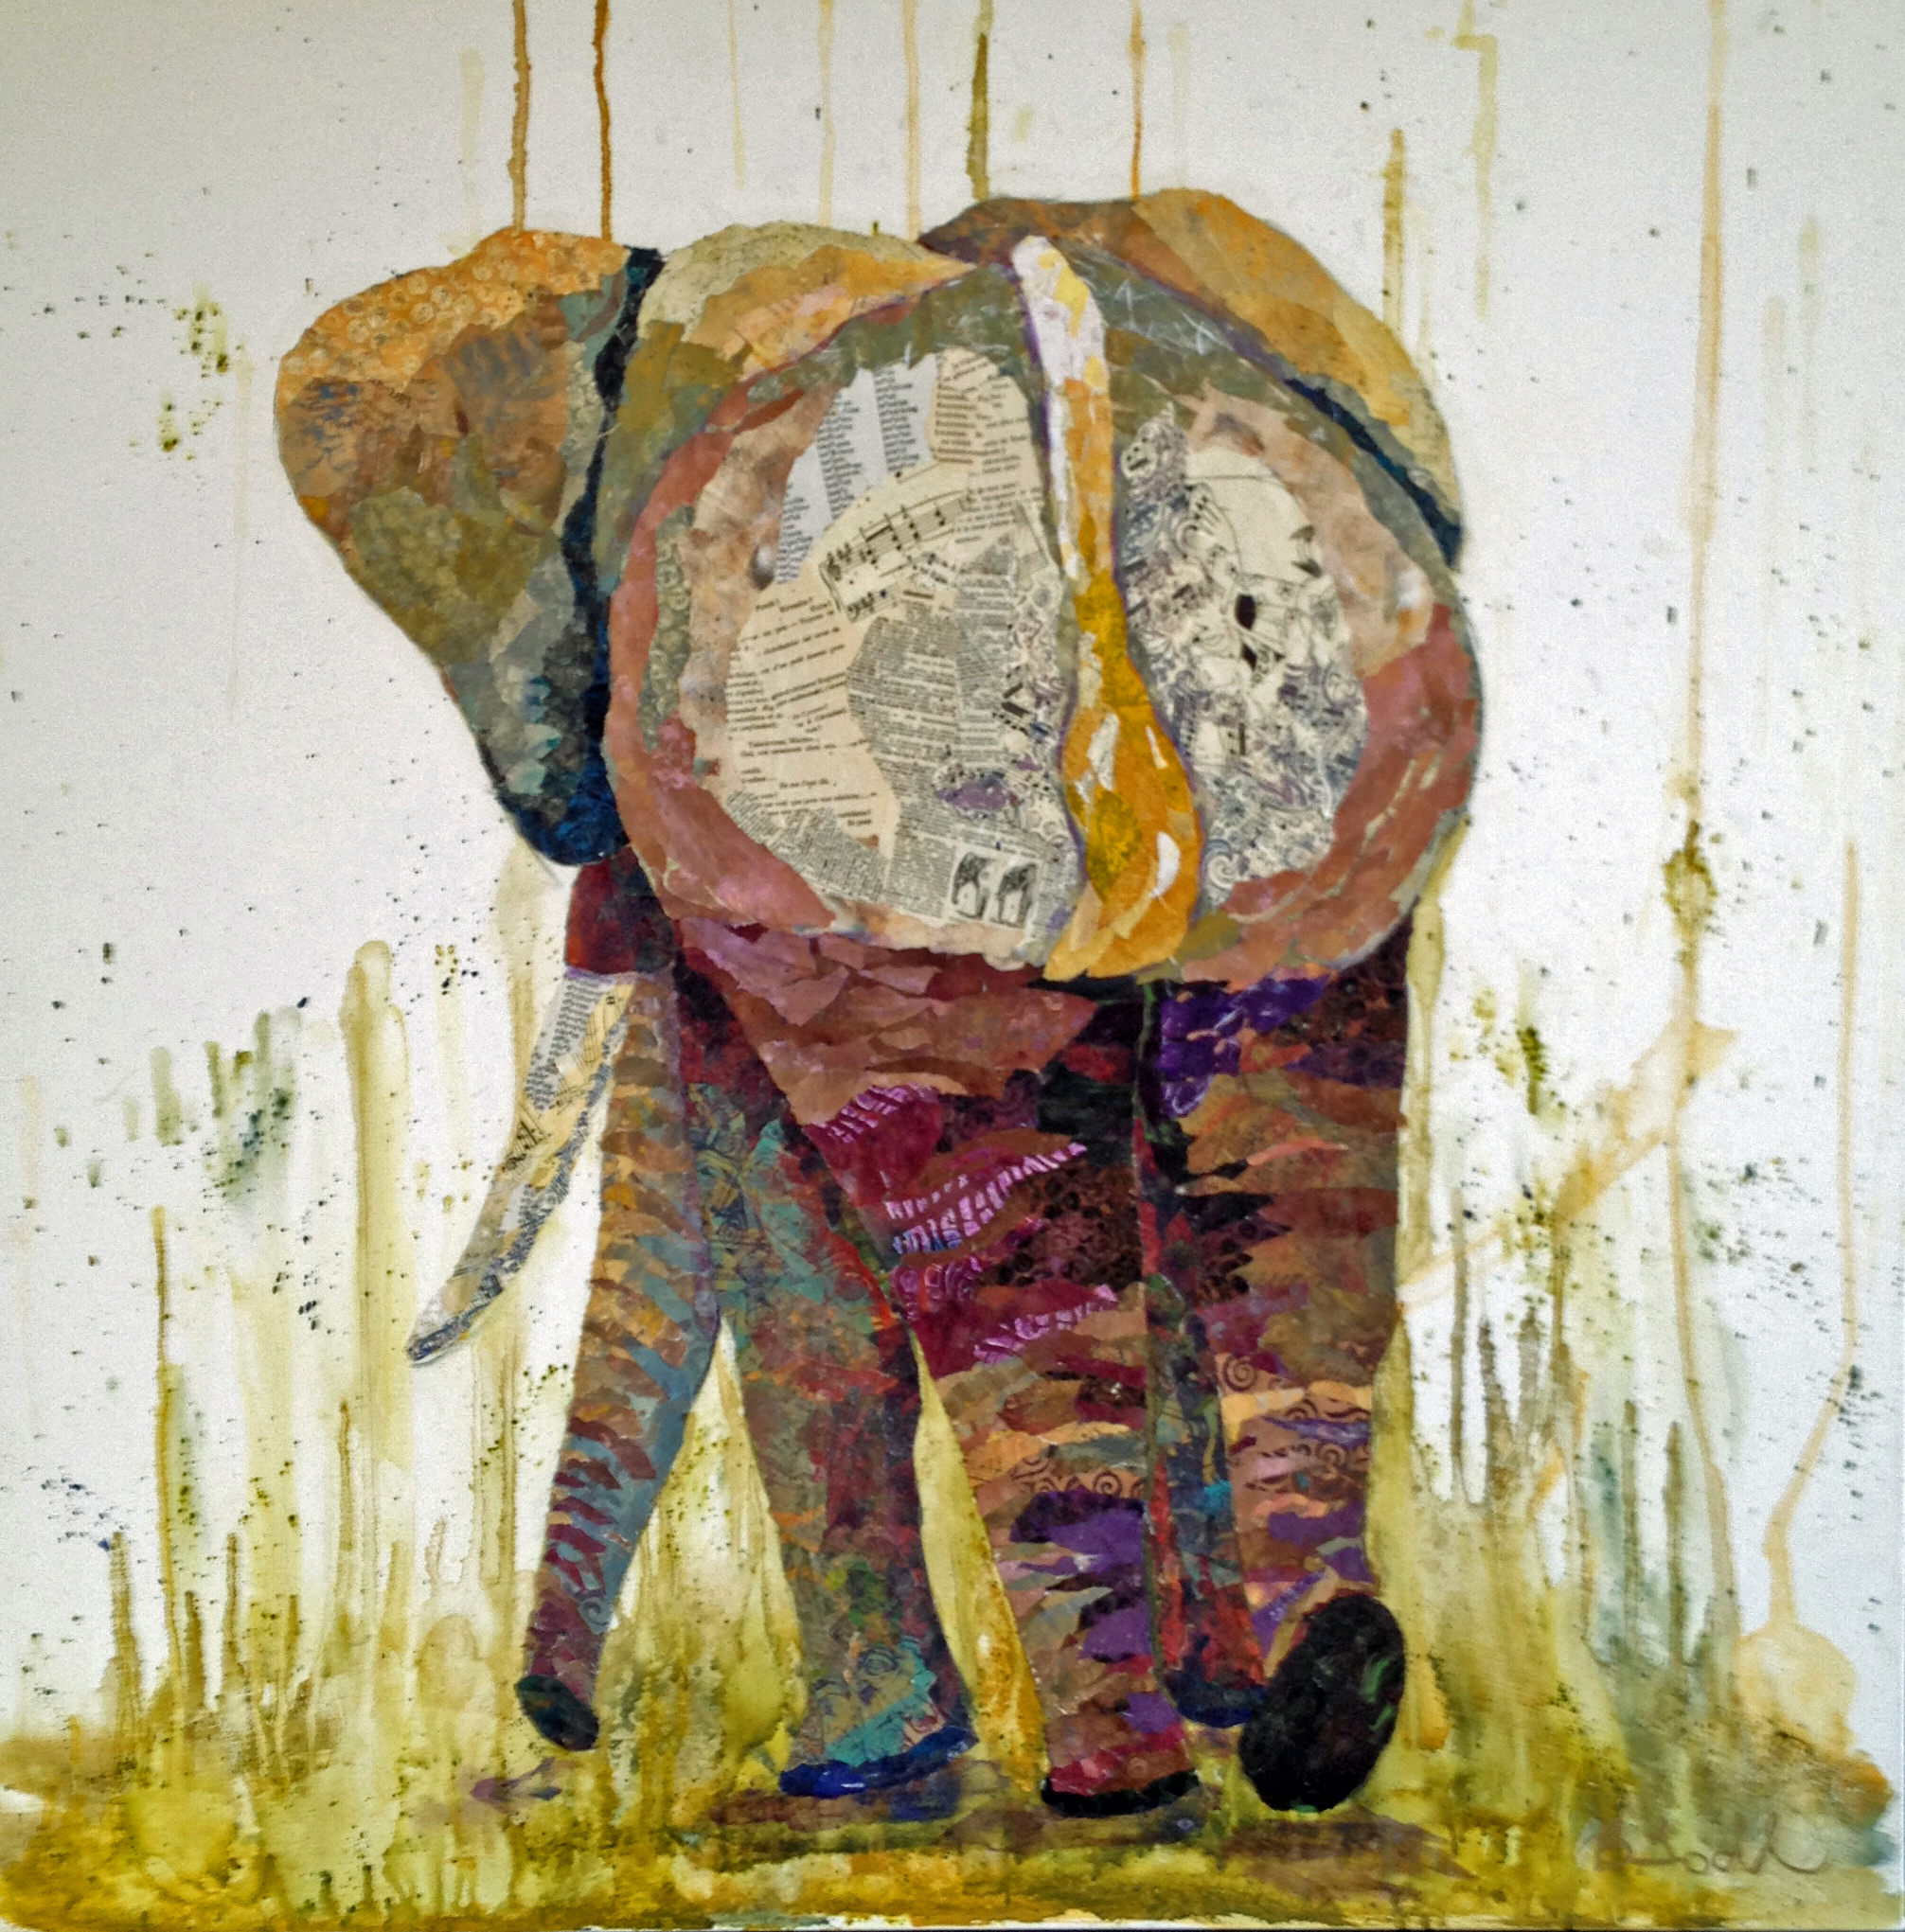 Ibby's Elephant